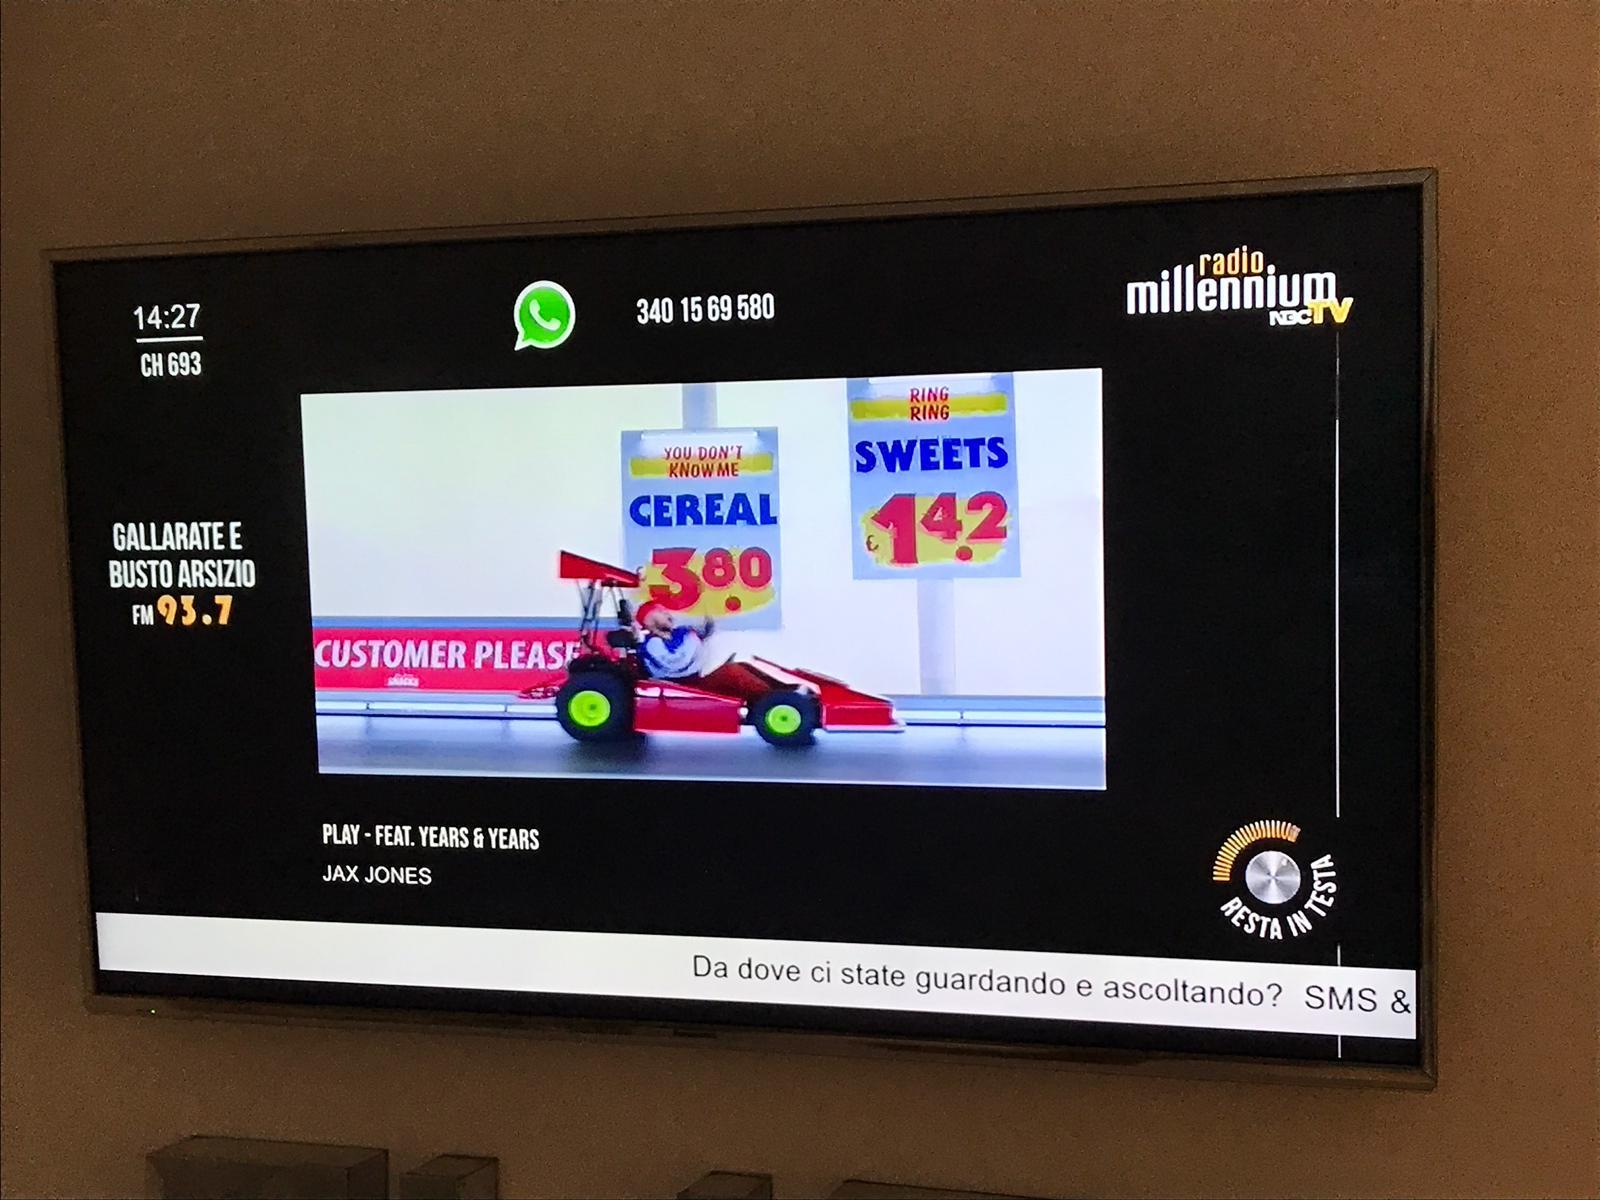 Radio Millennium Tv 693 - Siate affamati, siate folli